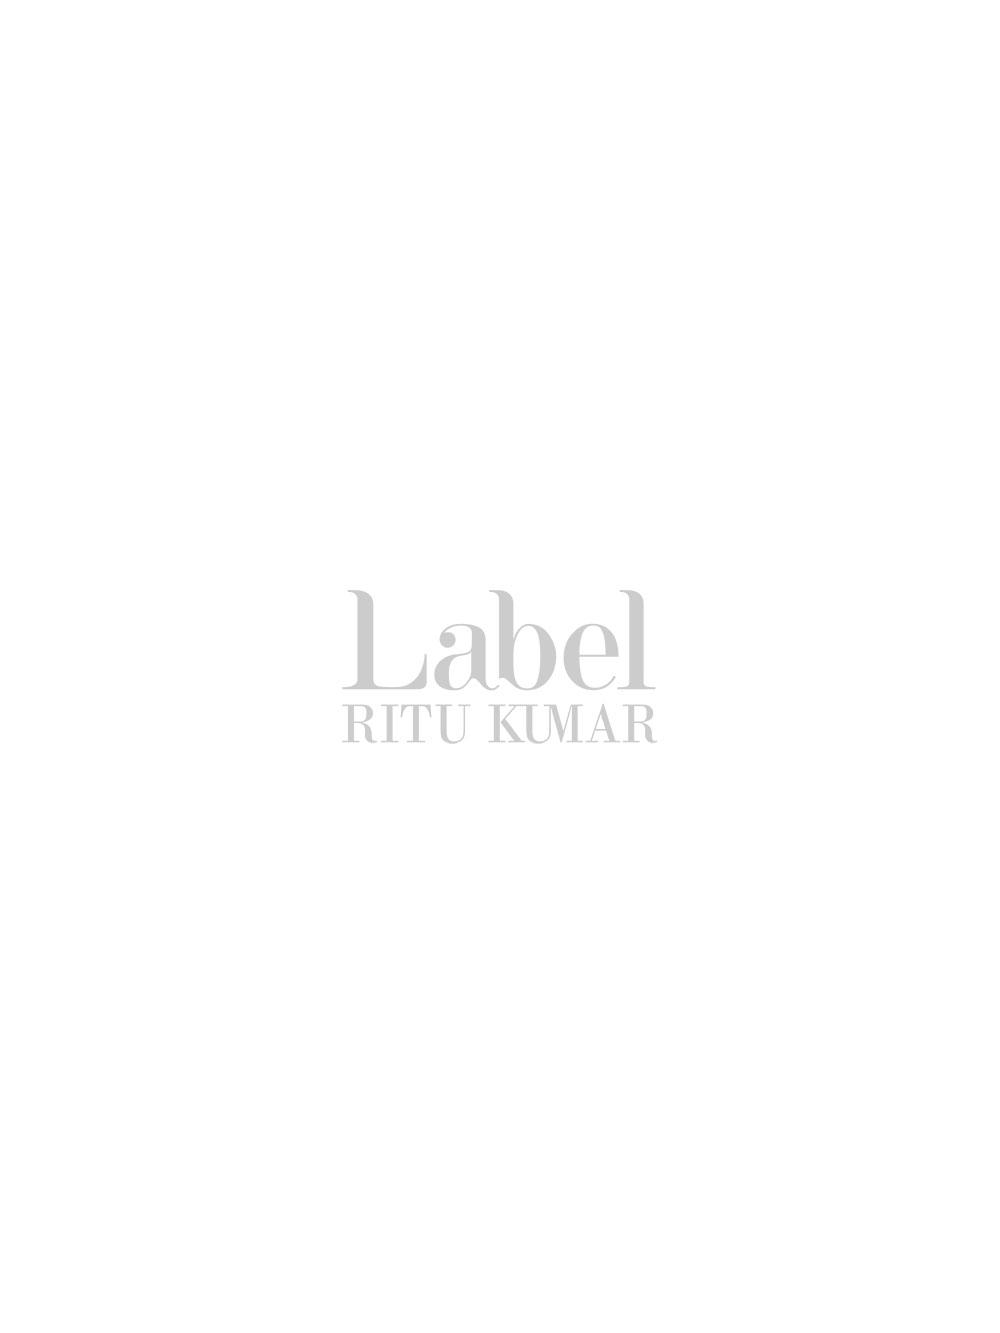 Black Leather Tote By Label Ritu Kumar